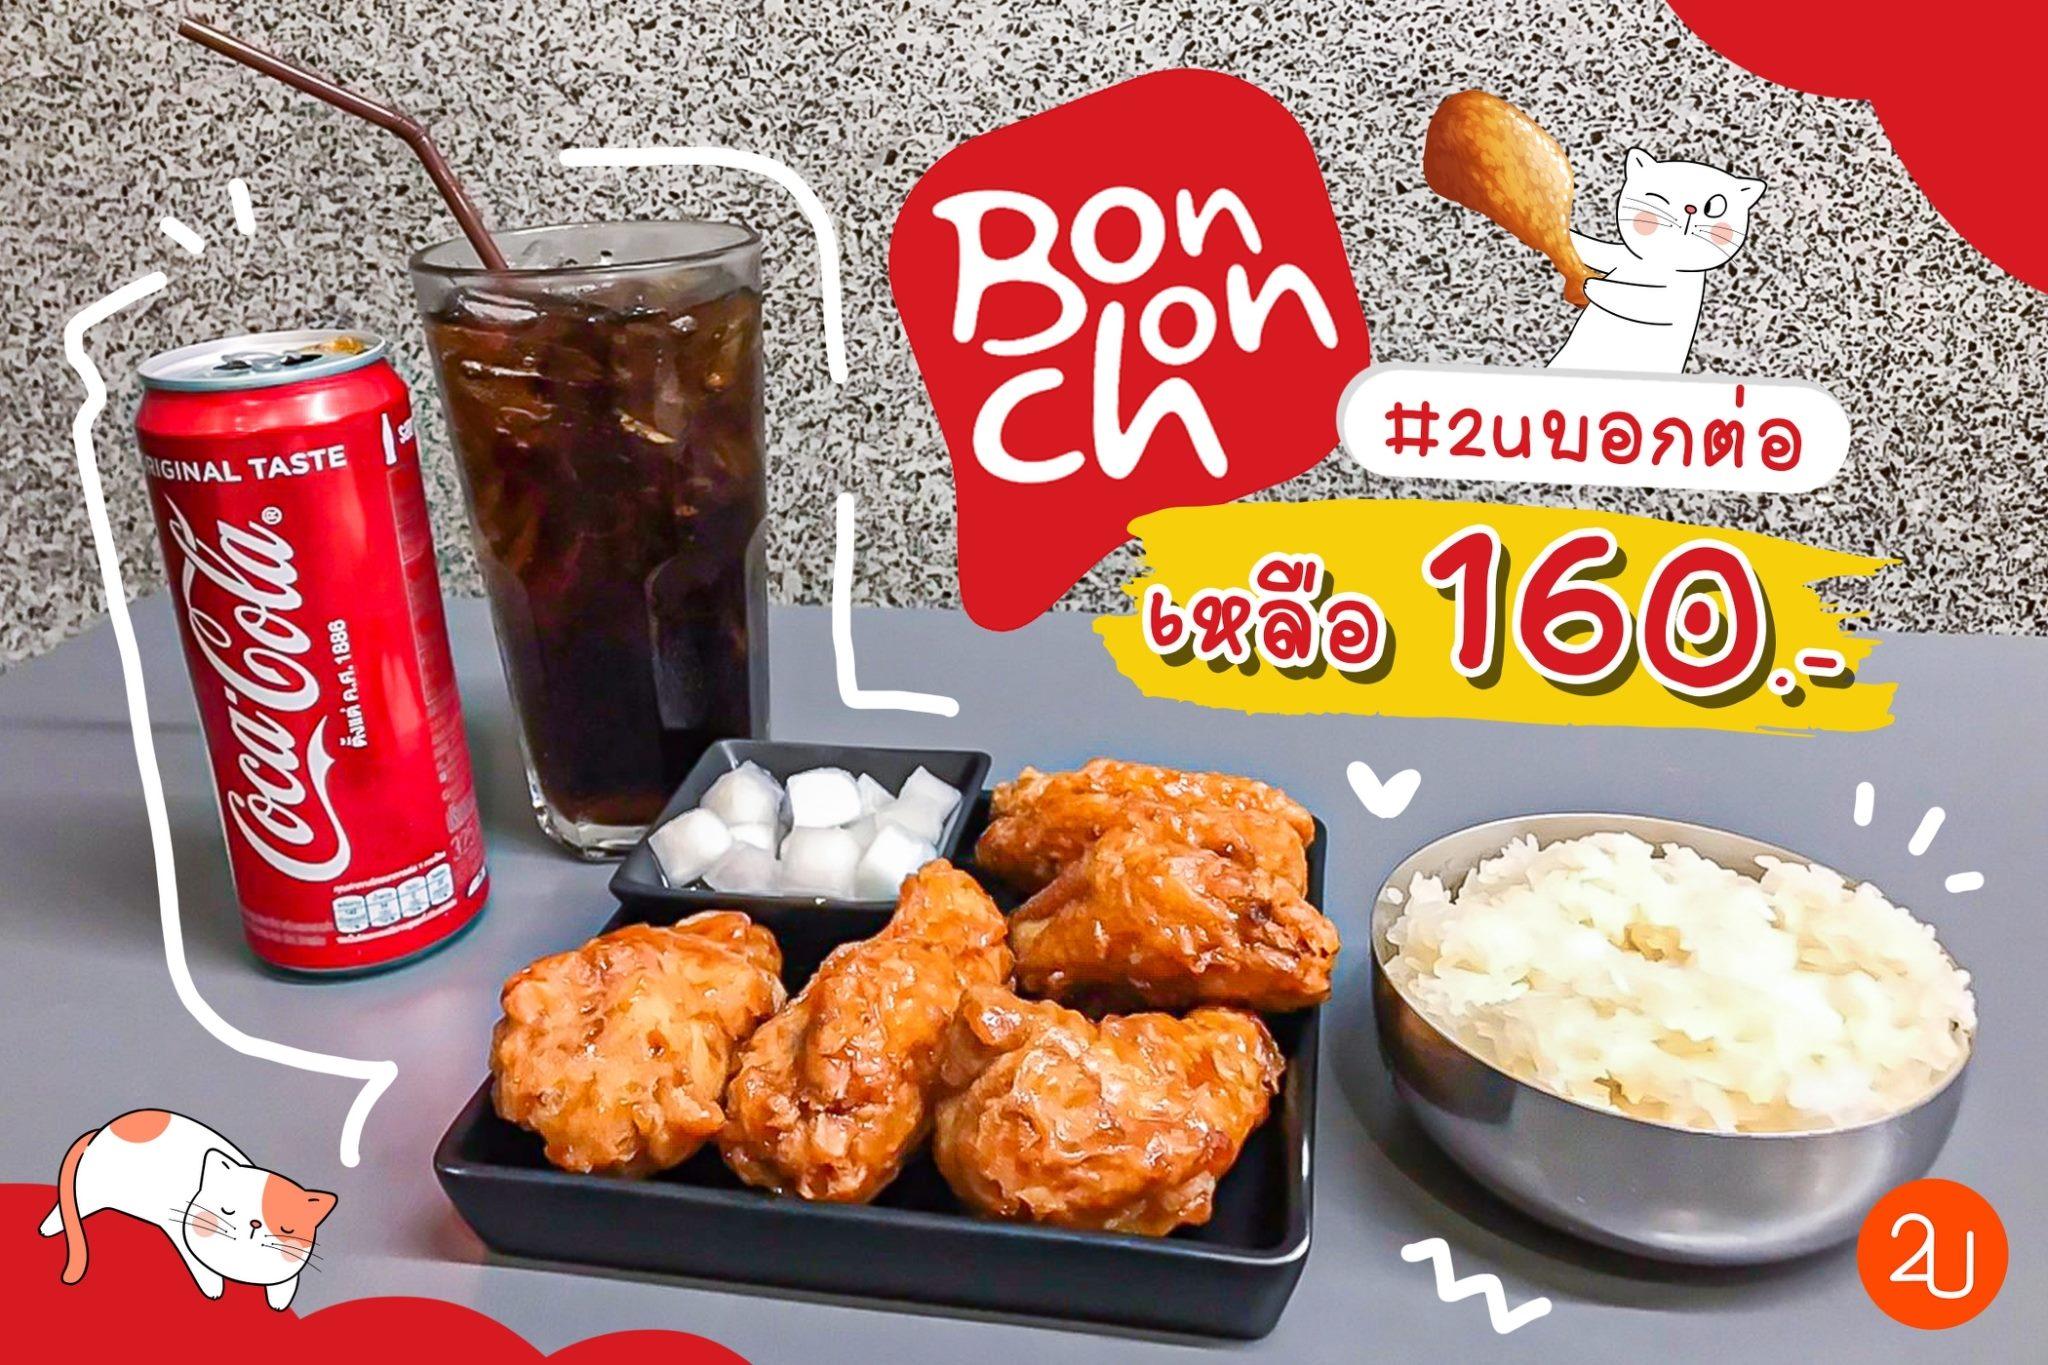 promotion Bonchon 160 bath